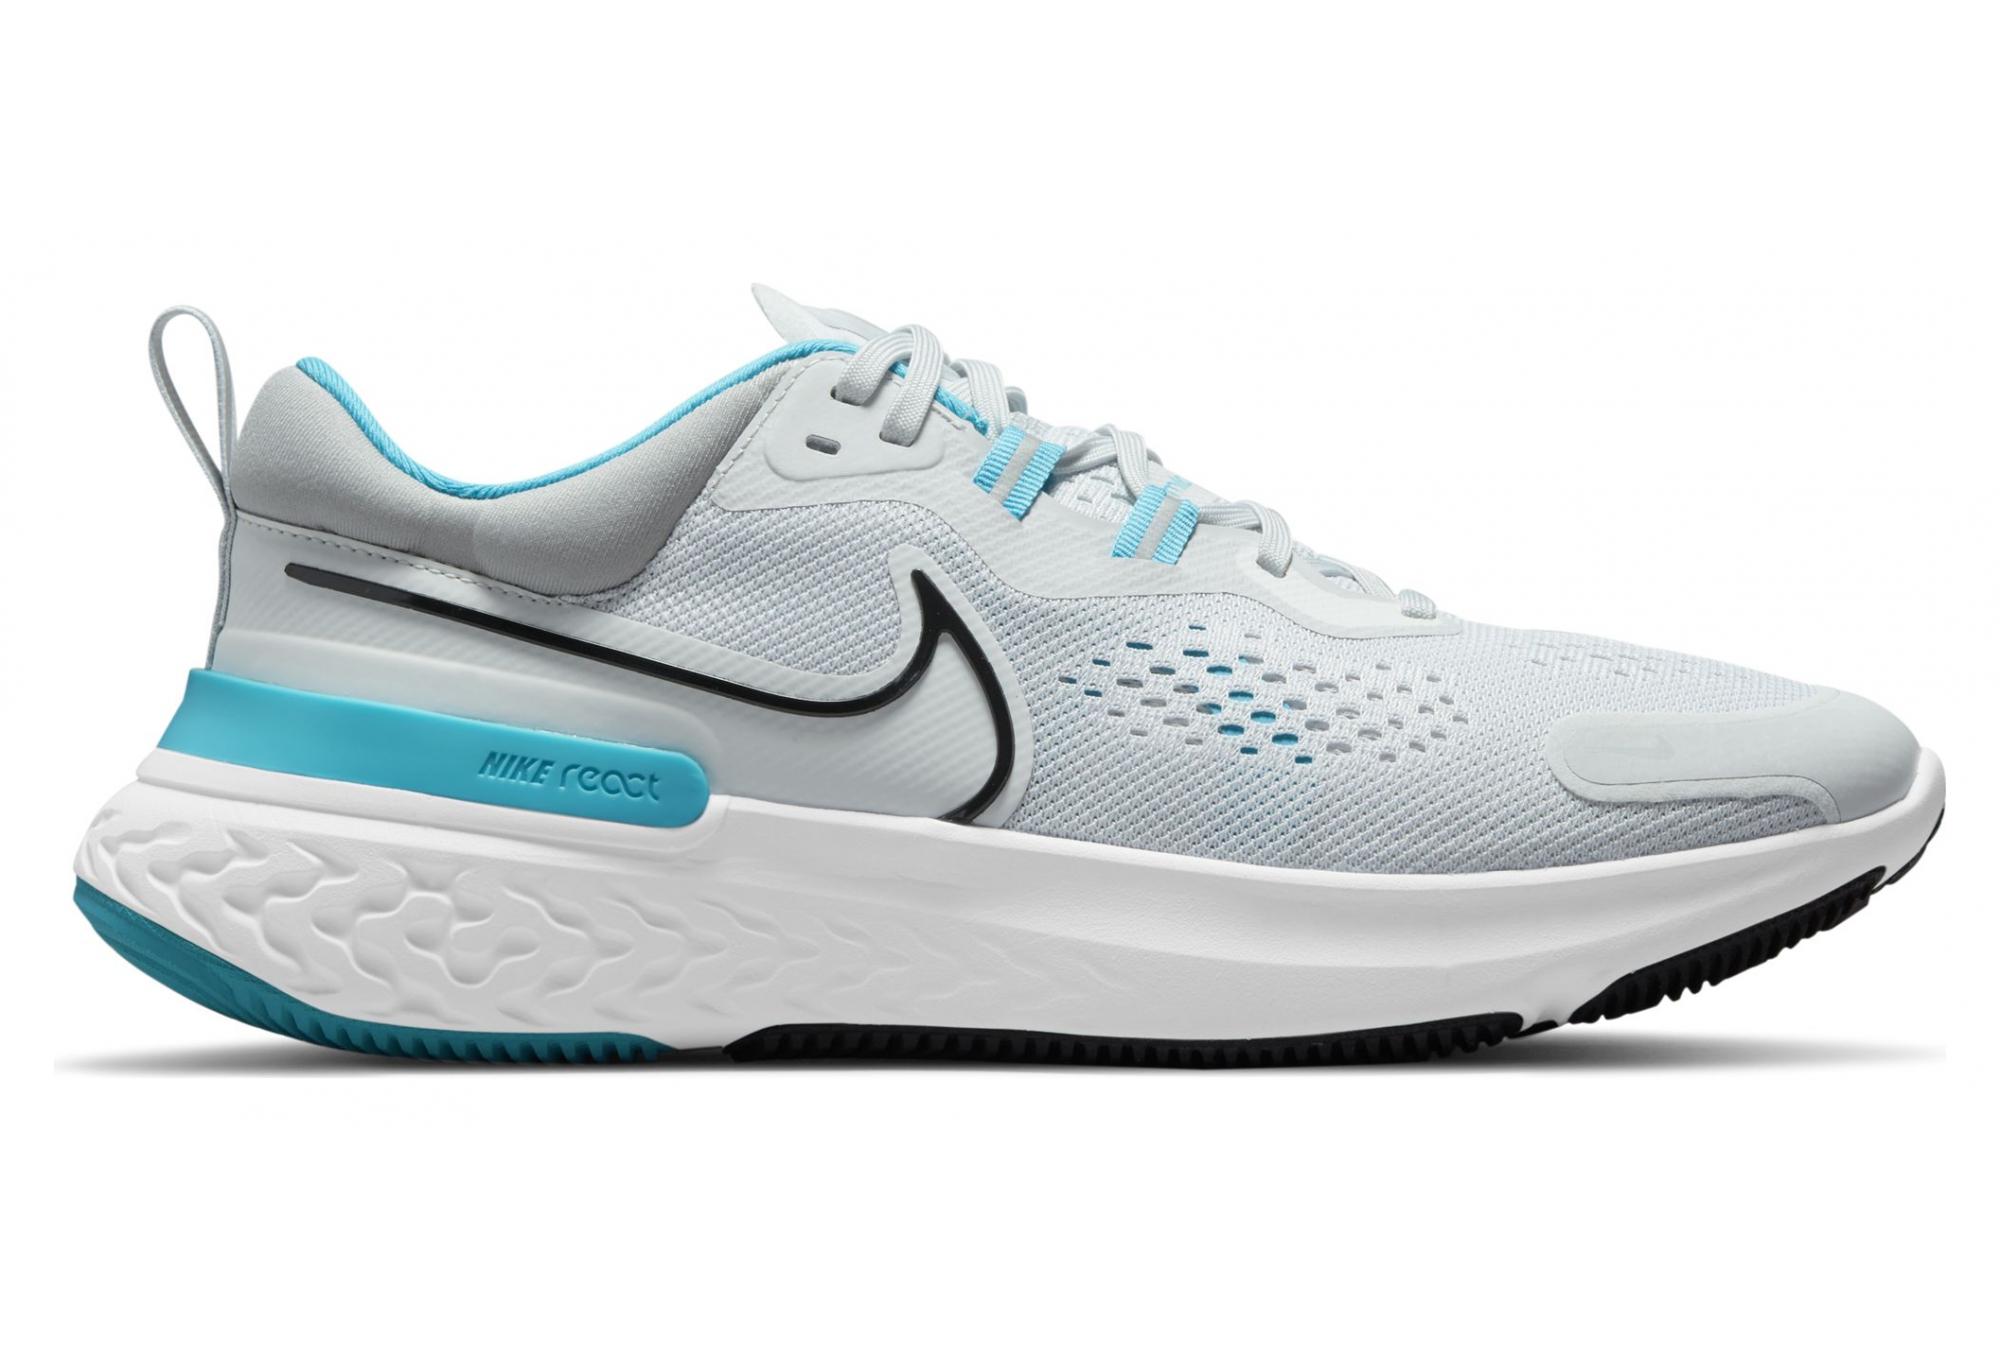 Nike React Miler 2 Gray / Blue Pair of Shoes